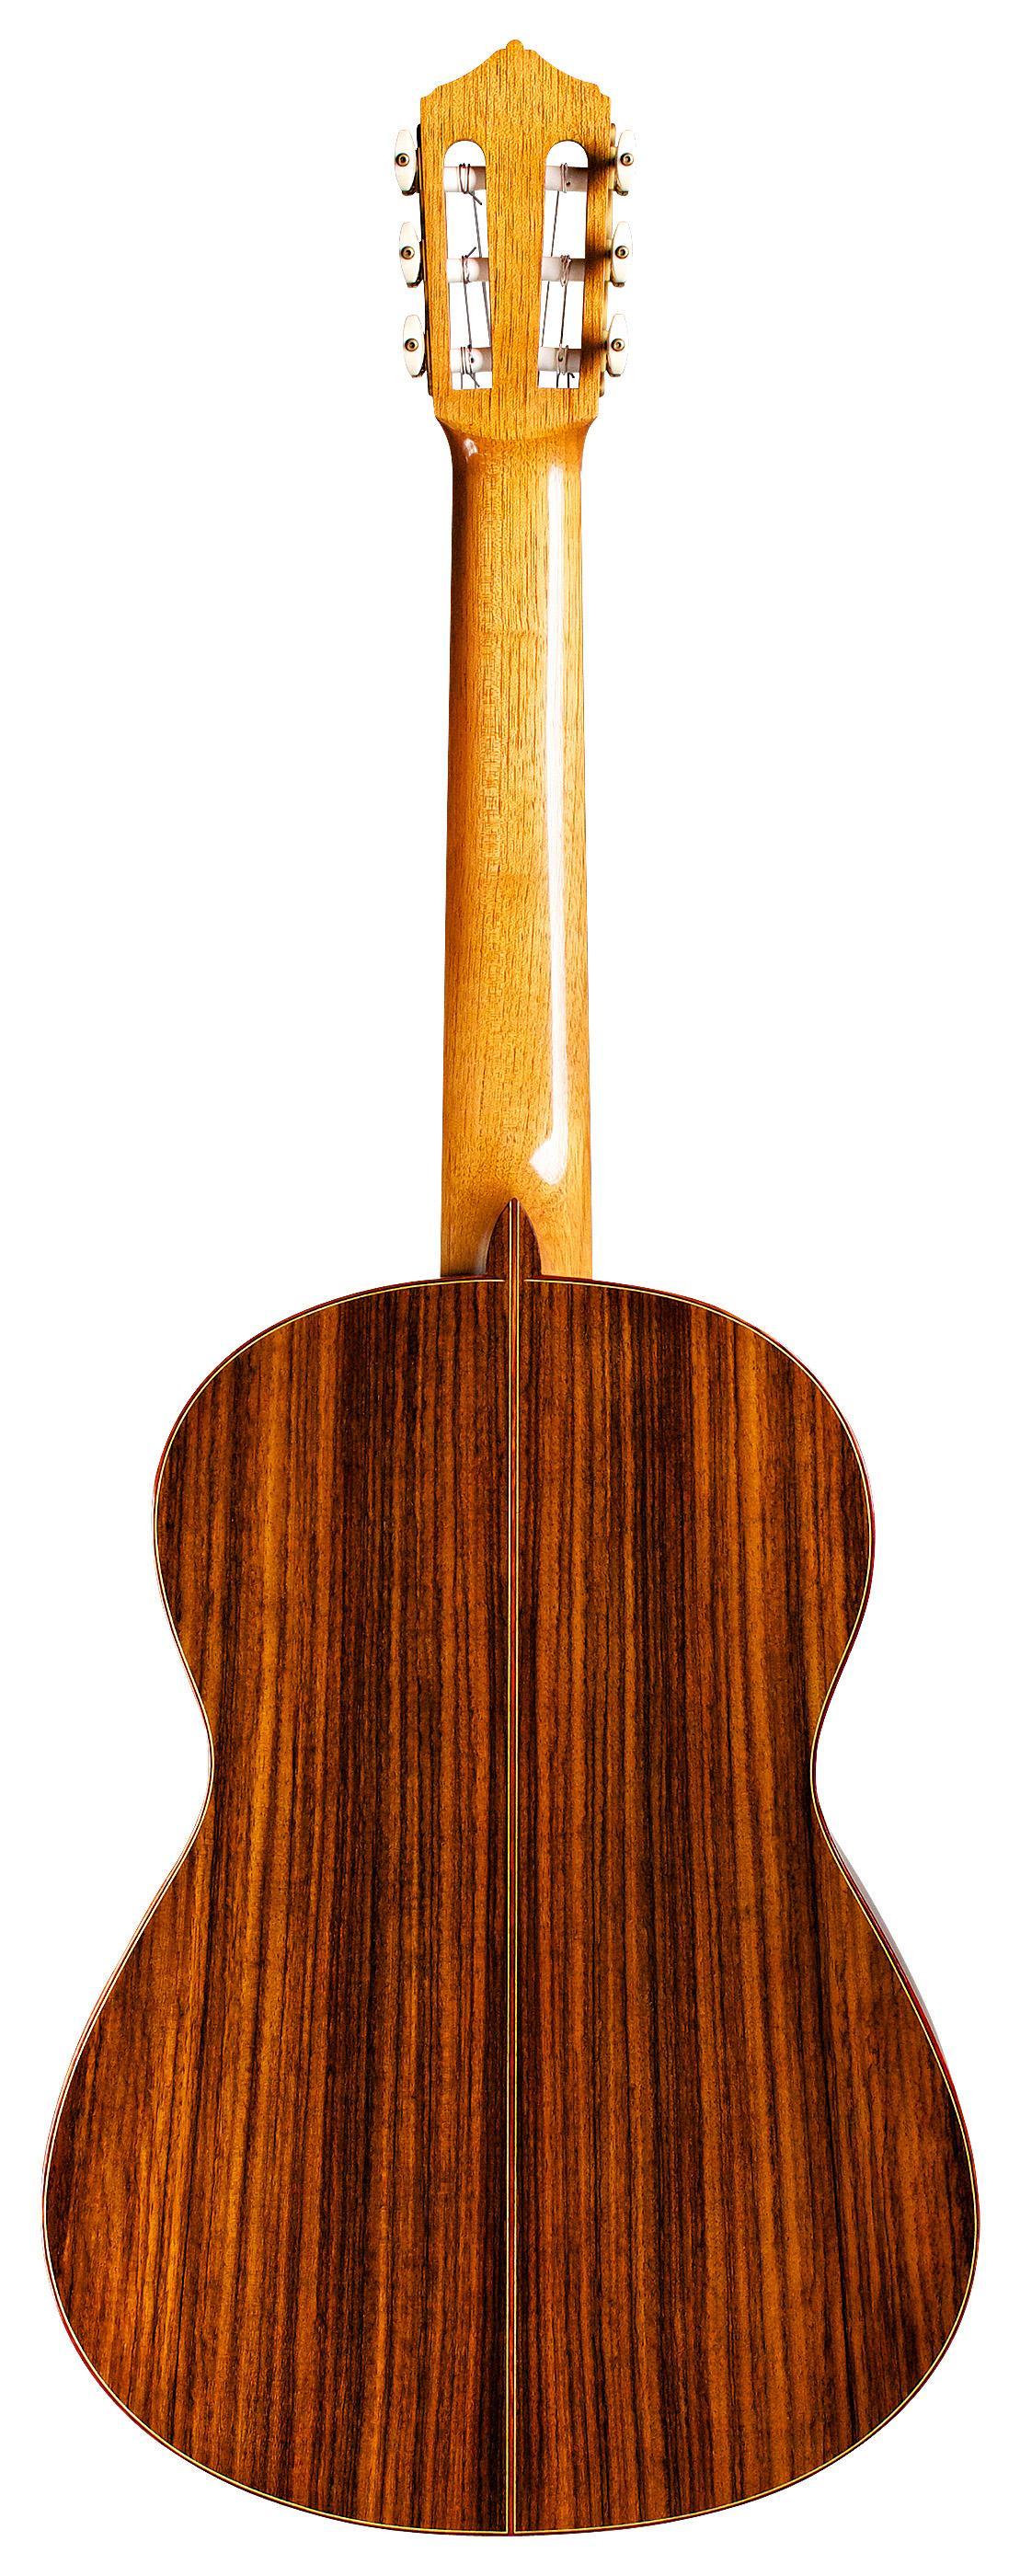 2015 Indian Rosewood/Cedar